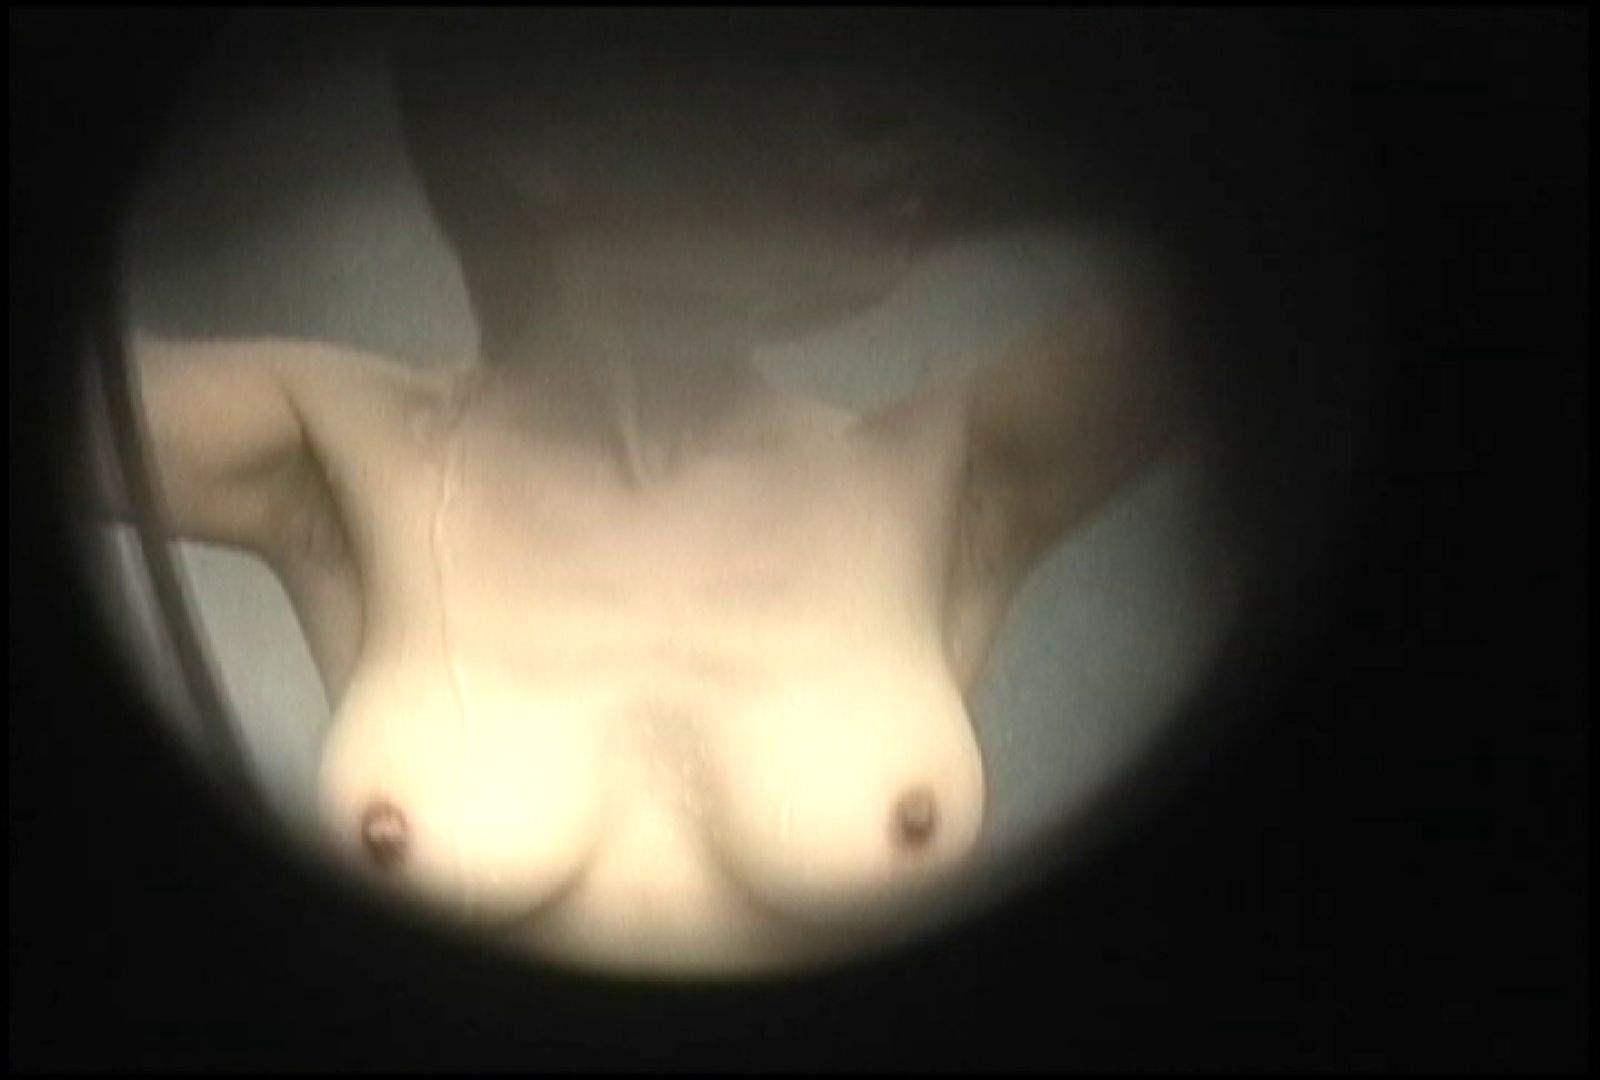 No.145 肩のタトゥーが切なさ誘うタレ巨乳おねえさま シャワー室 ワレメ動画紹介 30画像 17